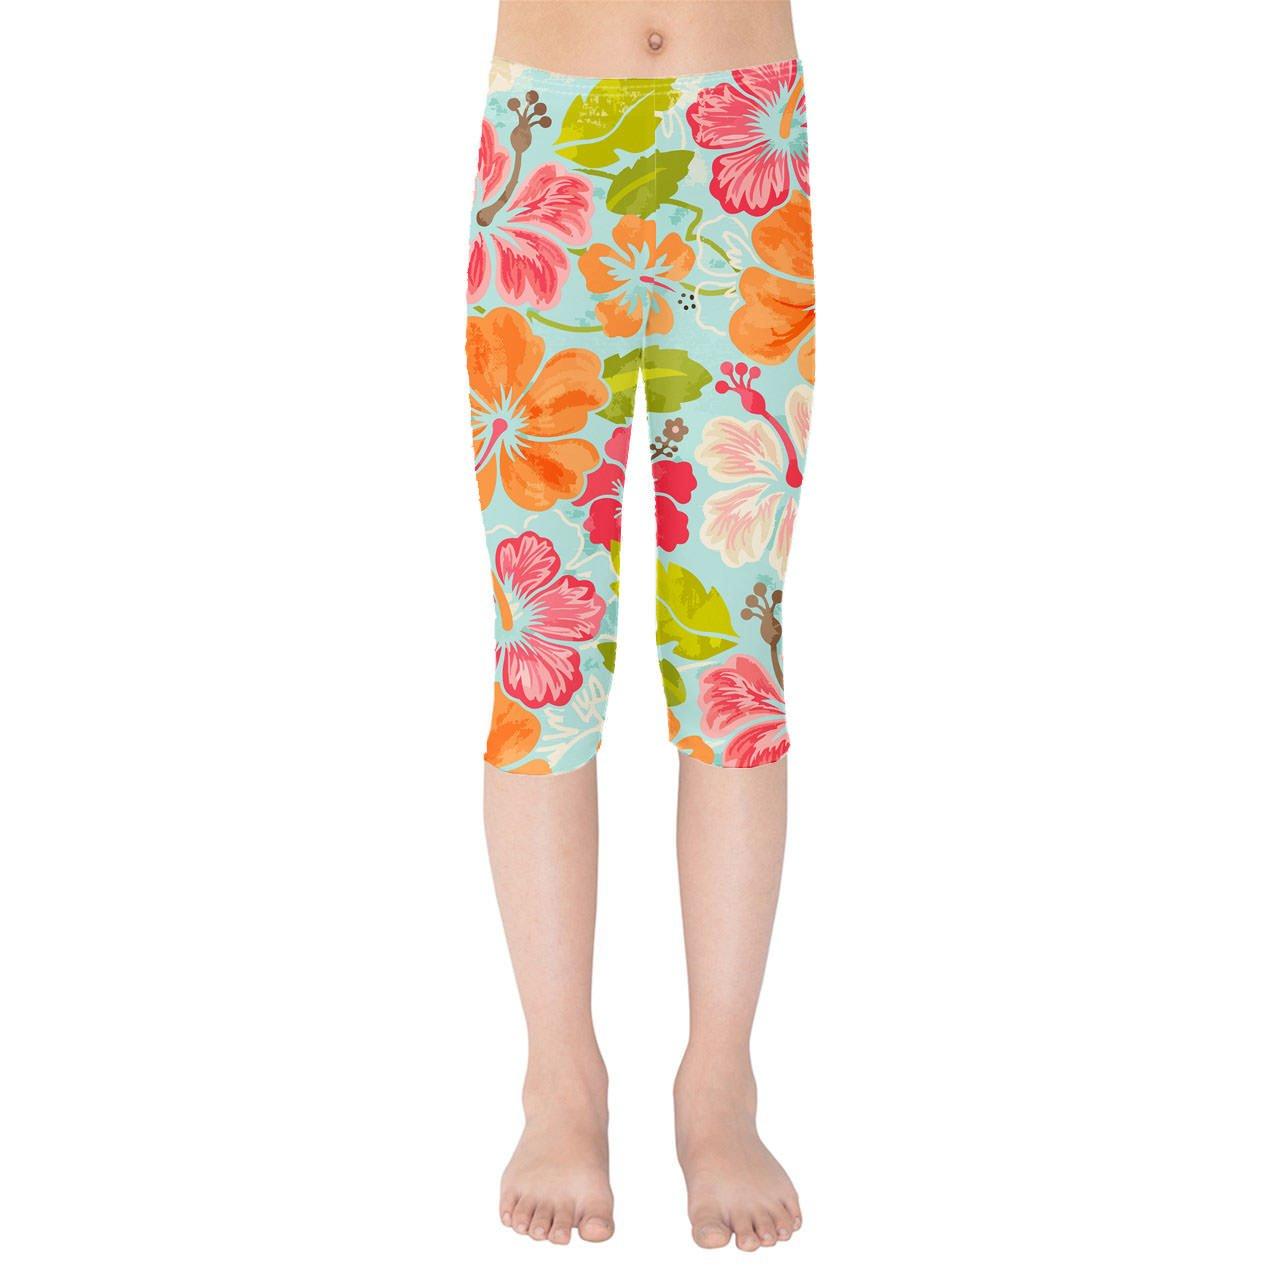 Aloha Kids Capri Leggings